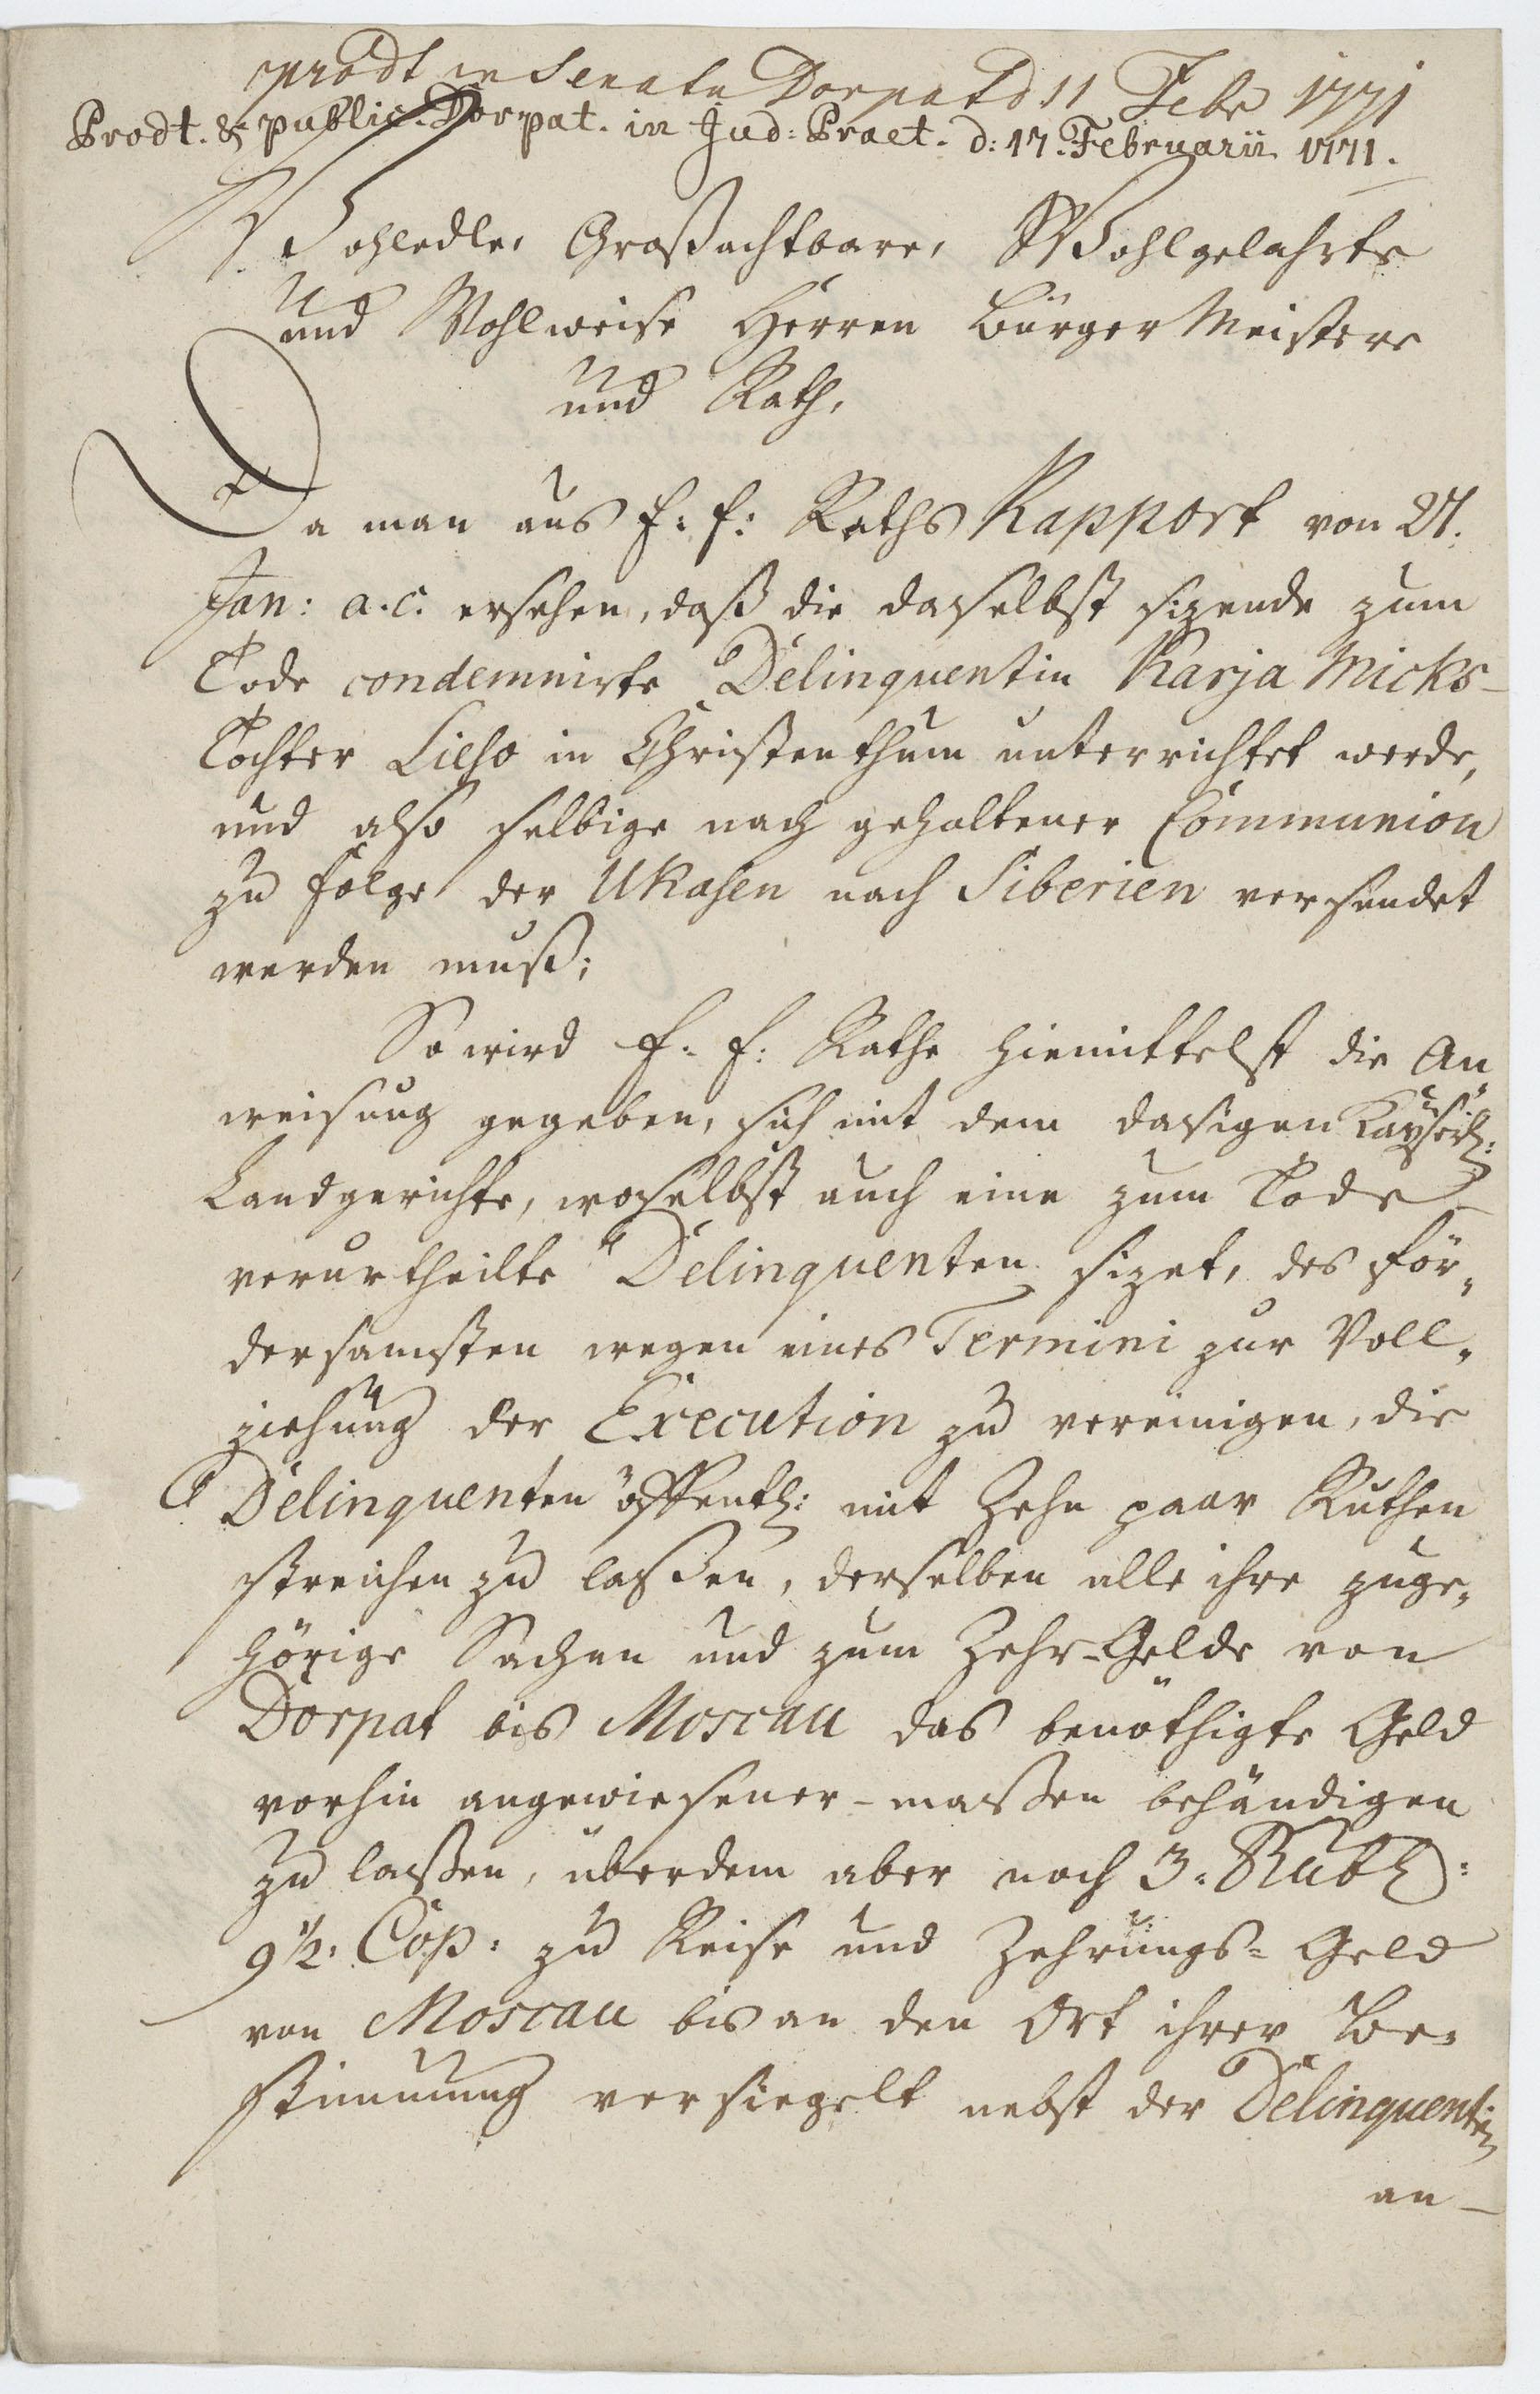 George von Browne'i ja asekuberner Balthasar von Campenhausen'i kiri Tartu magistraadile. EAA 995.1.2948.